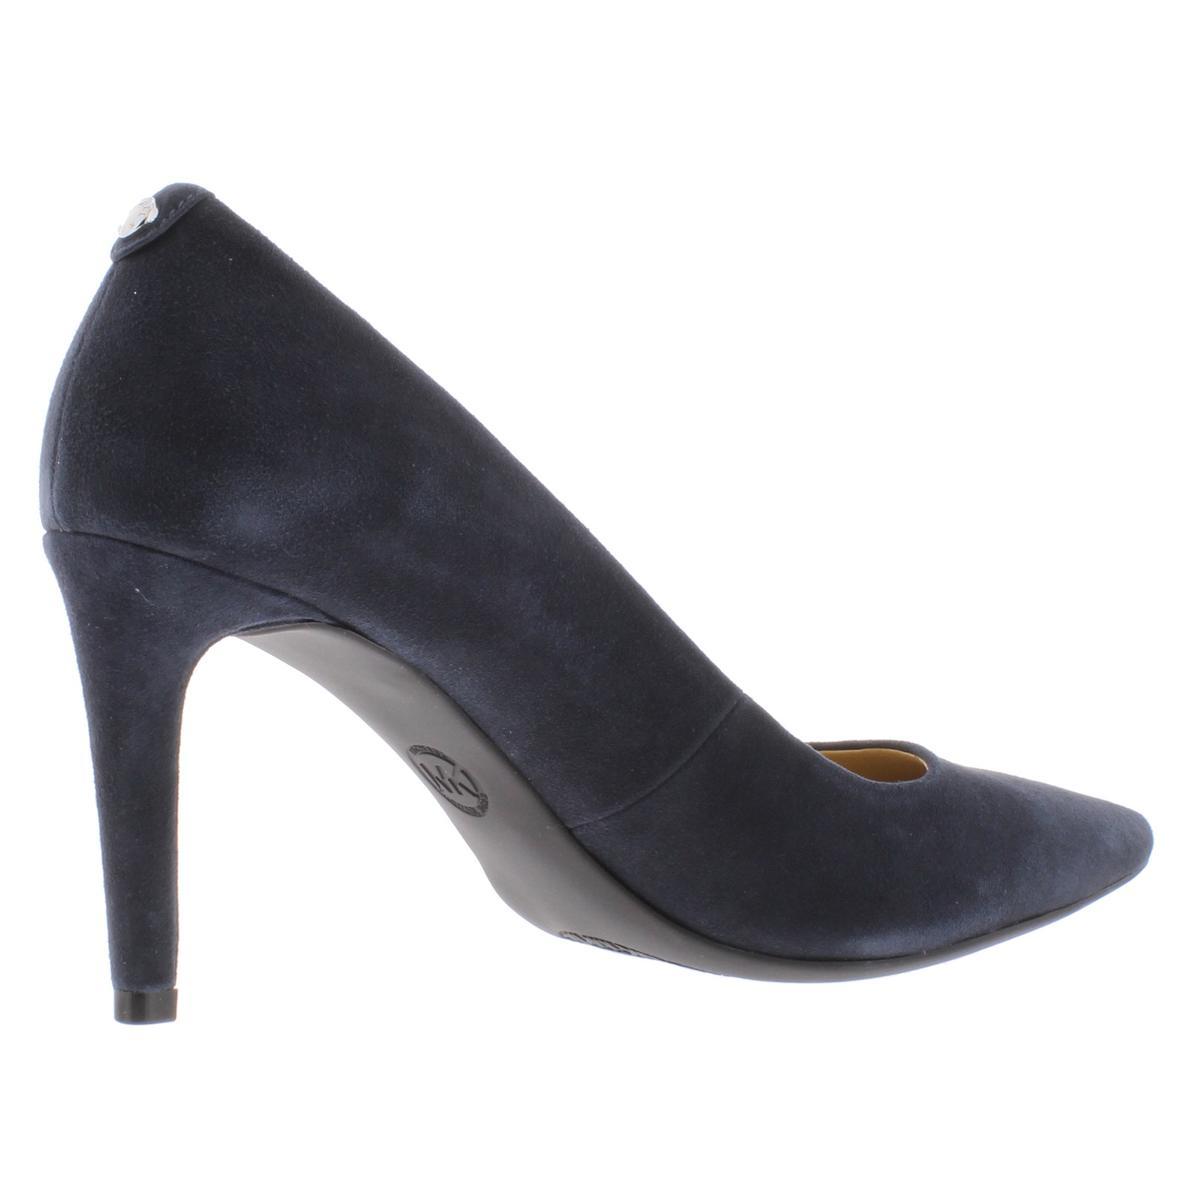 MICHAEL-Michael-Kors-Womens-Dorothy-Suede-Pumps-Dress-Heels-Shoes-BHFO-6408 thumbnail 4